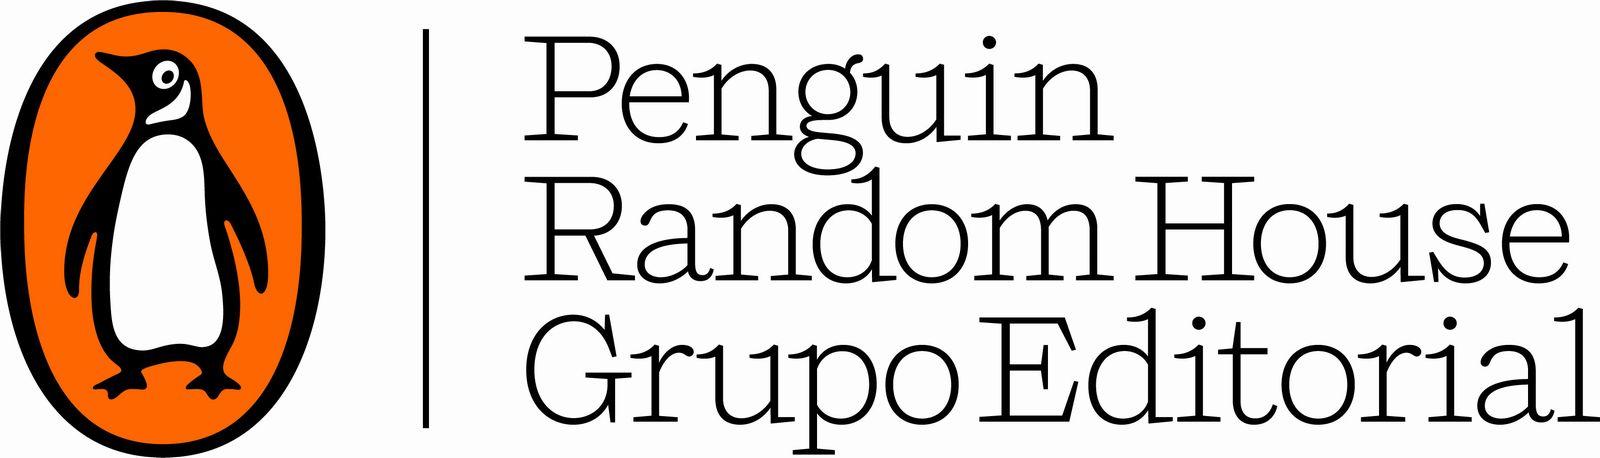 Penguin random house grupo editorial logo